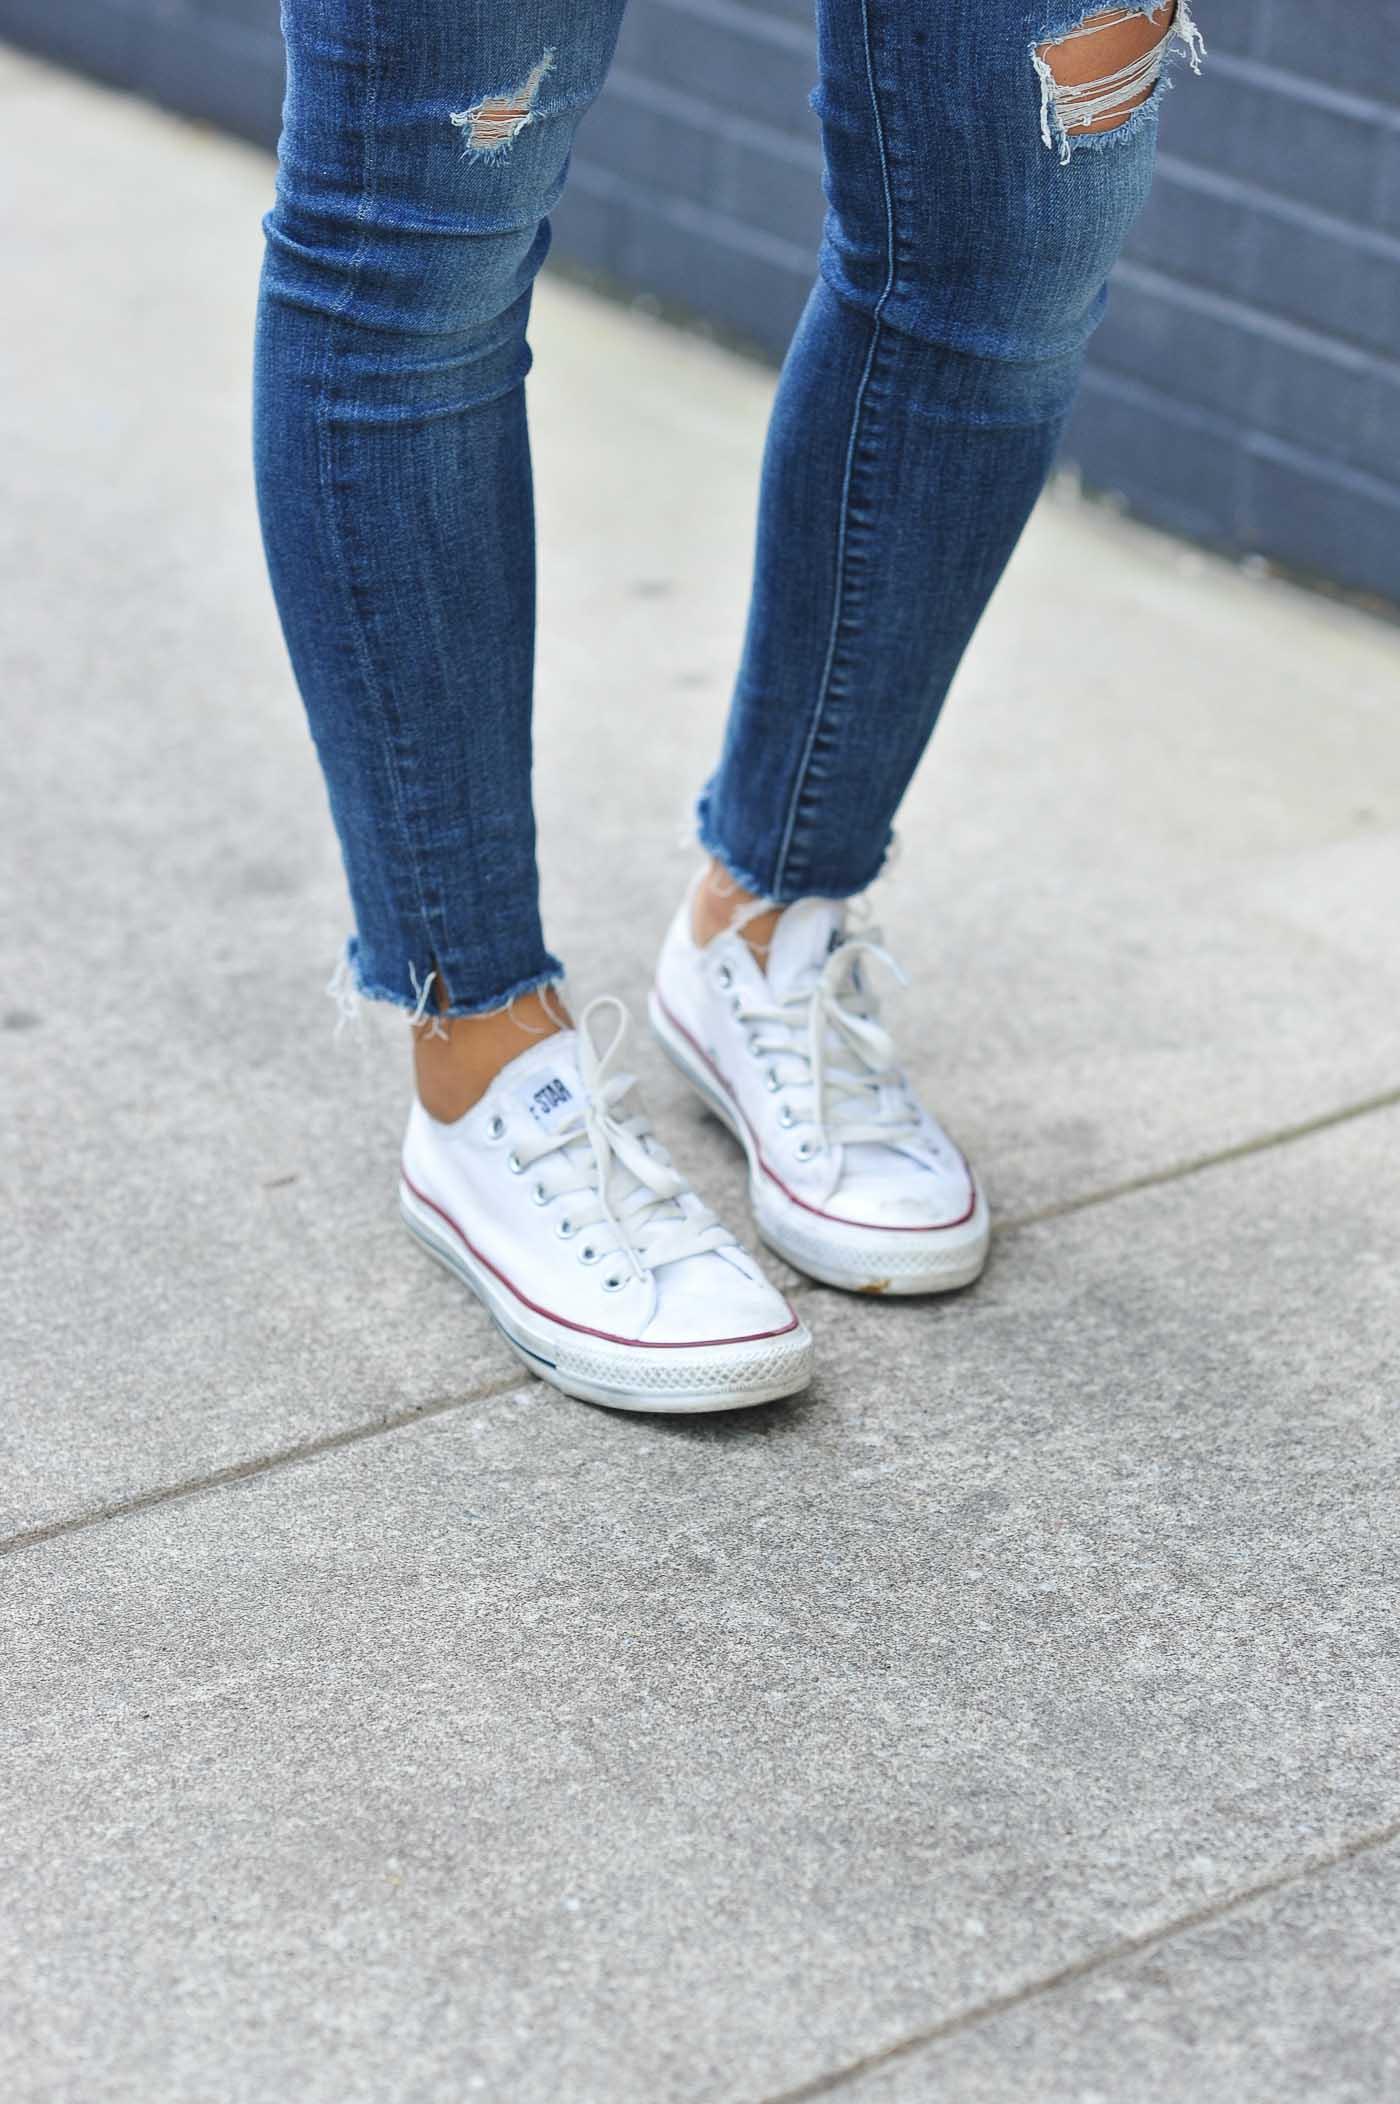 converse, denim and chucks - My Style Vita @mystylevita